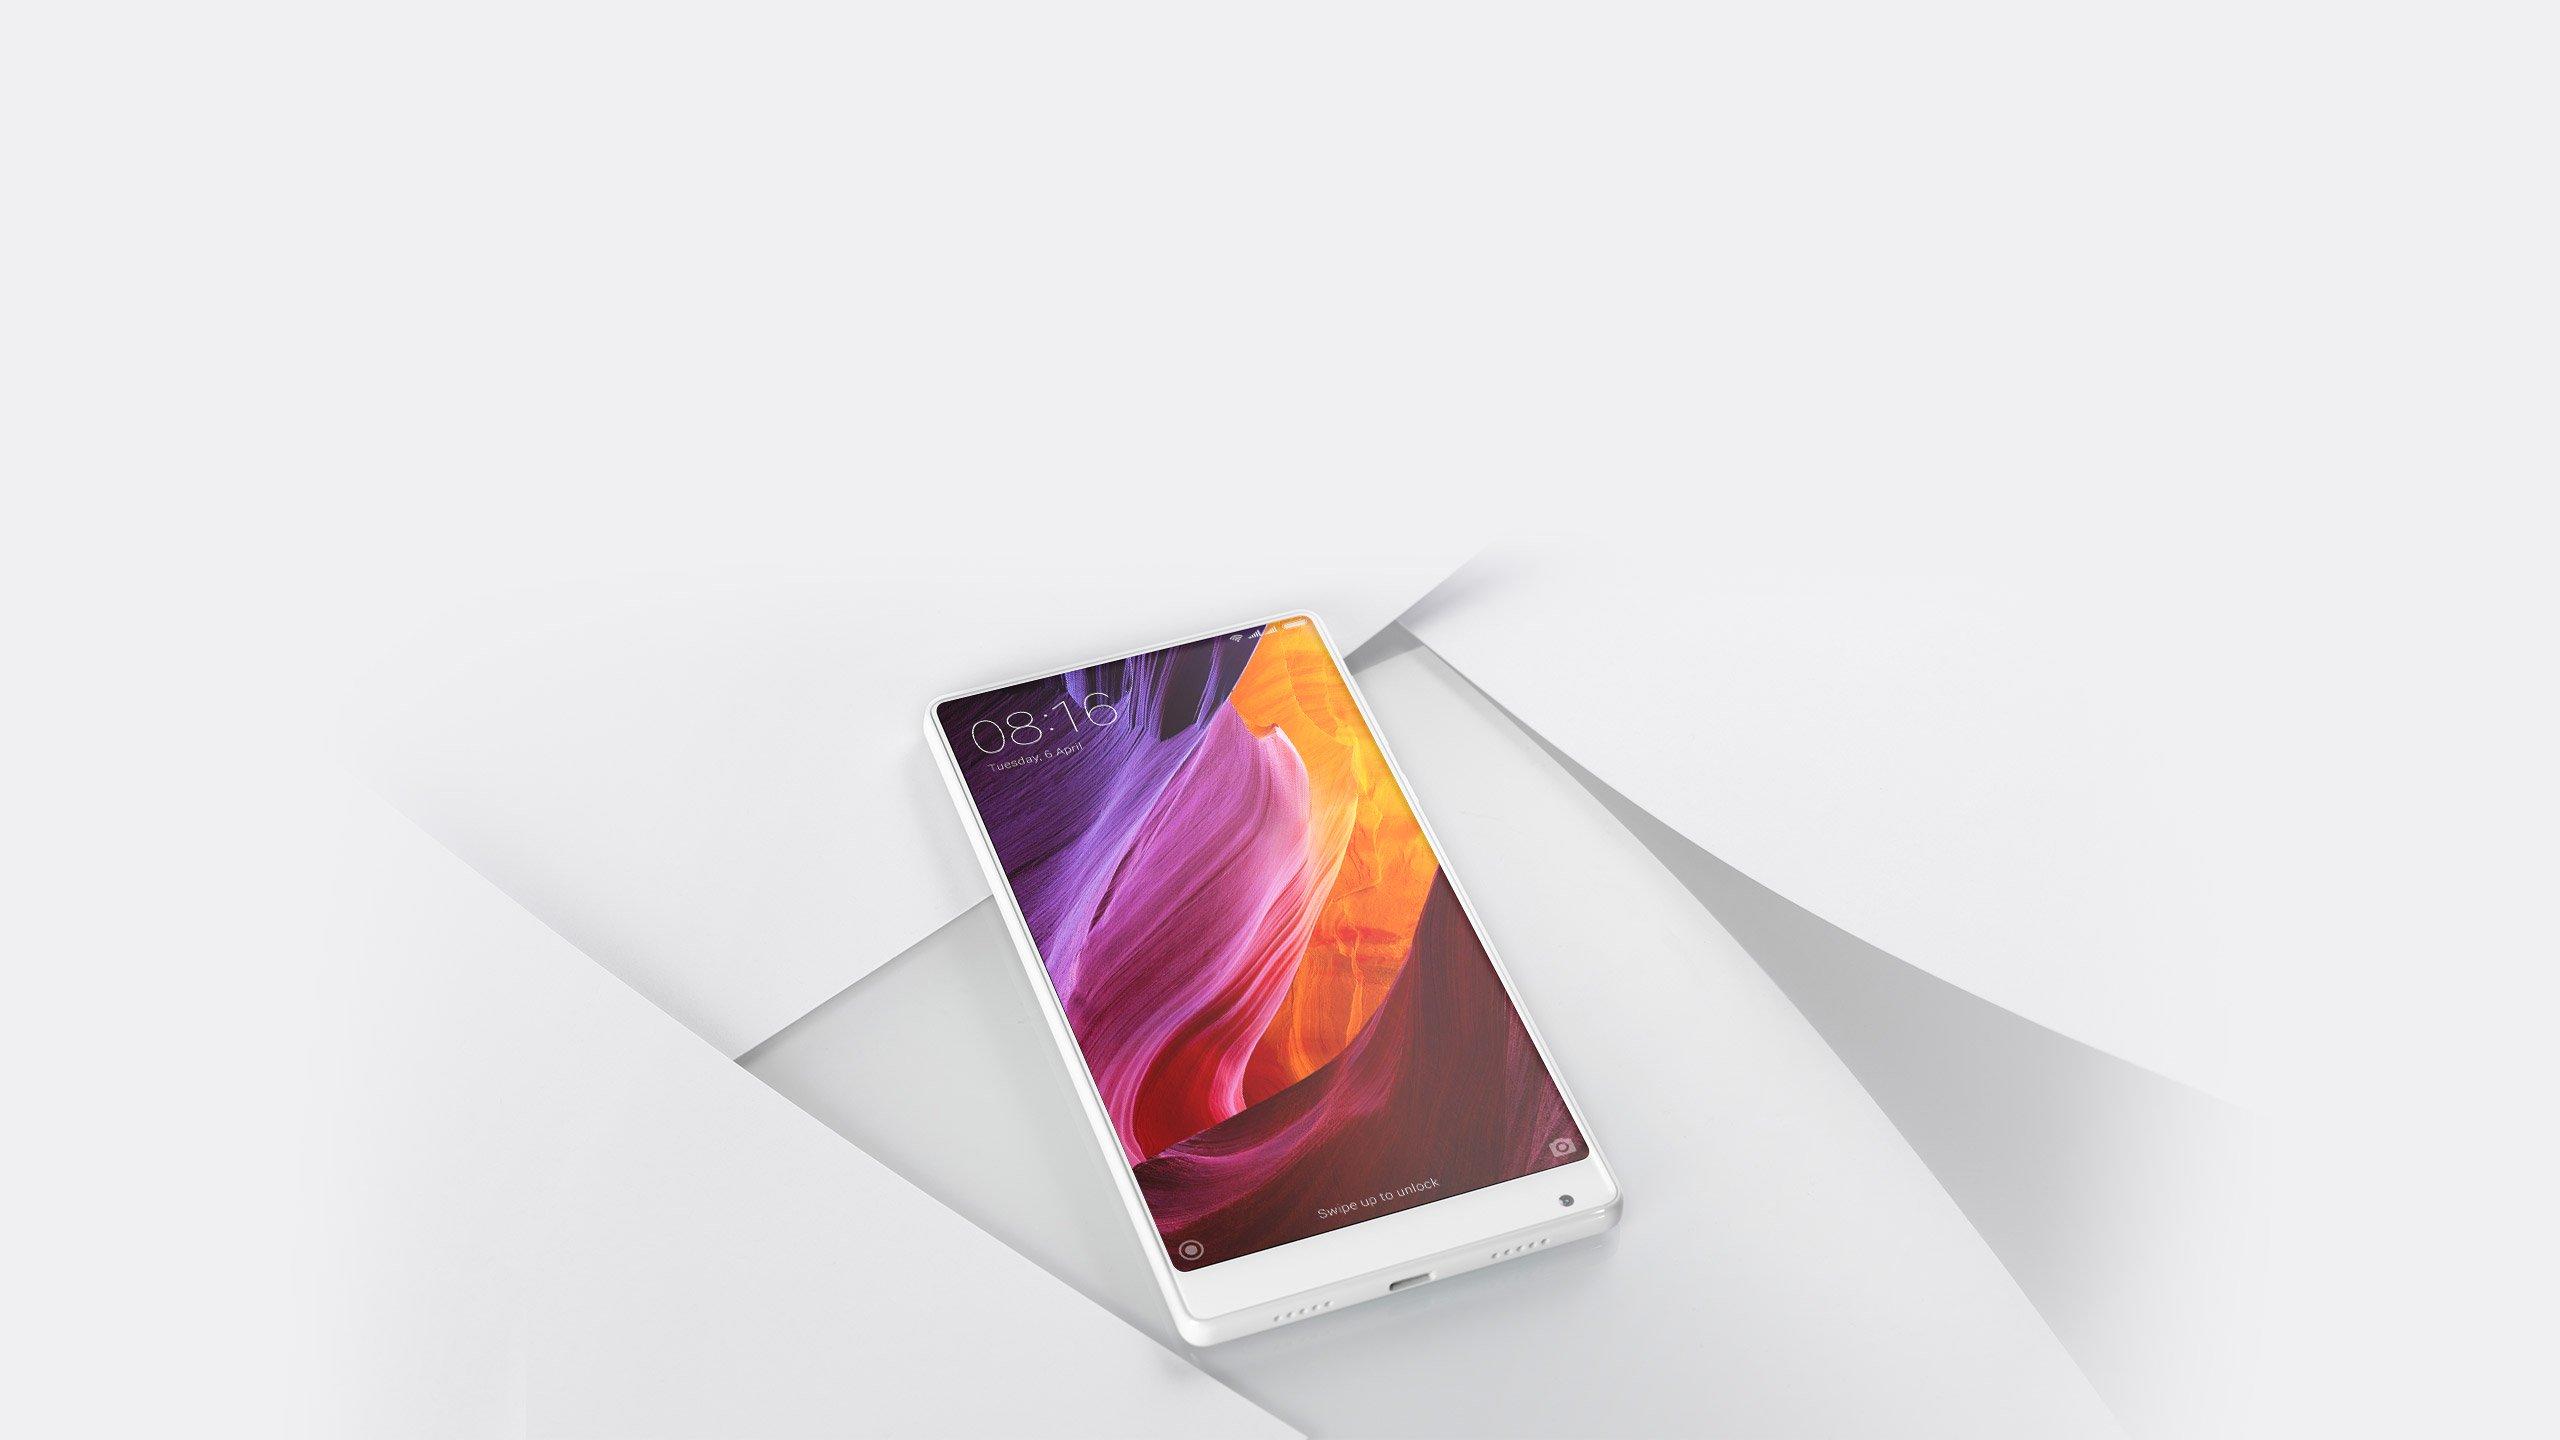 http://www.telefonguru.hu/images/content/overall-future-w-bg.jpg